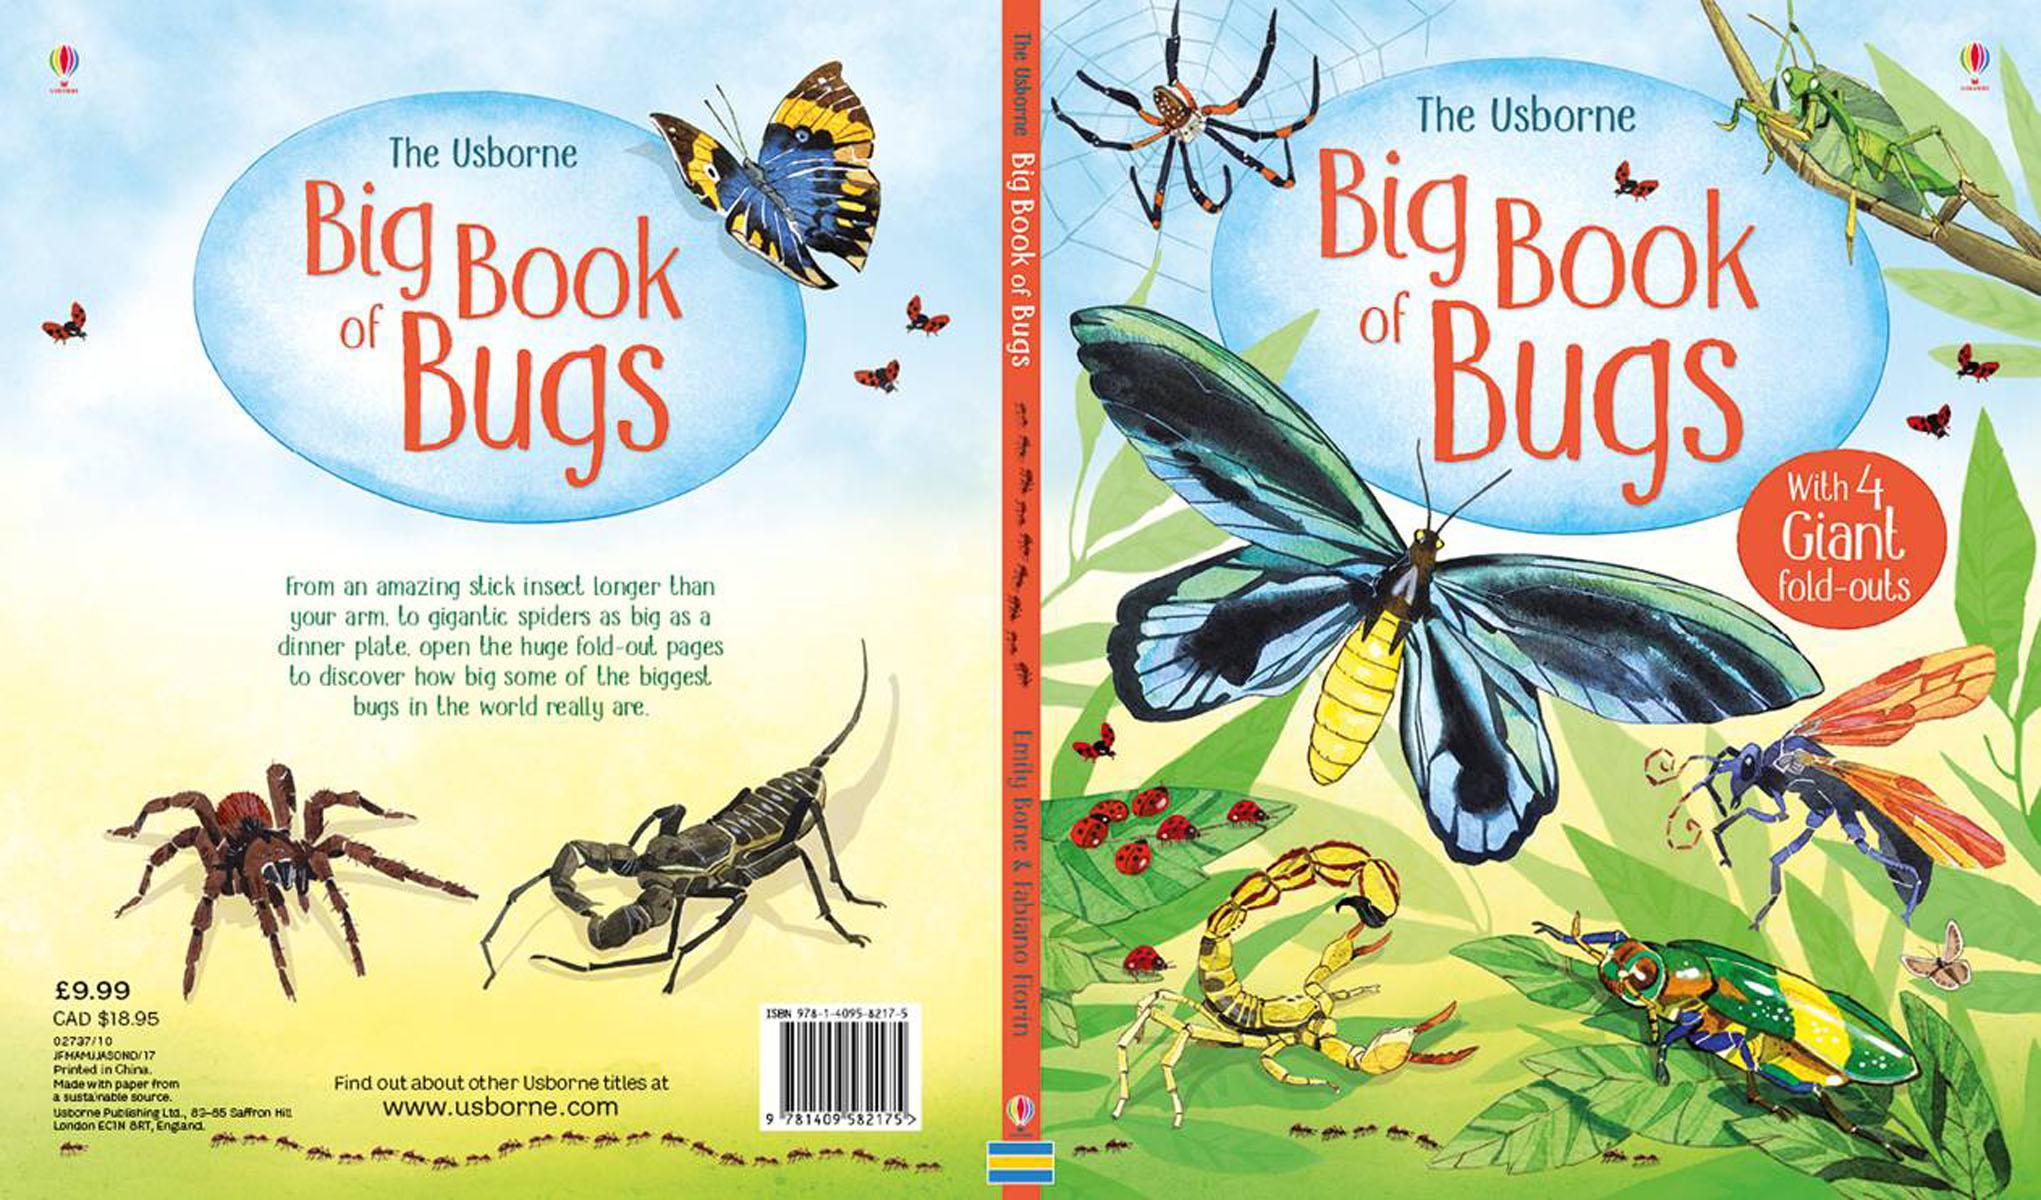 The Usborne Big Book of Bugs motorcycle new adjustable cnc billet short folding brake clutch levers for triumph tiger explorer 1200 2012 2015 2013 2014 12 15